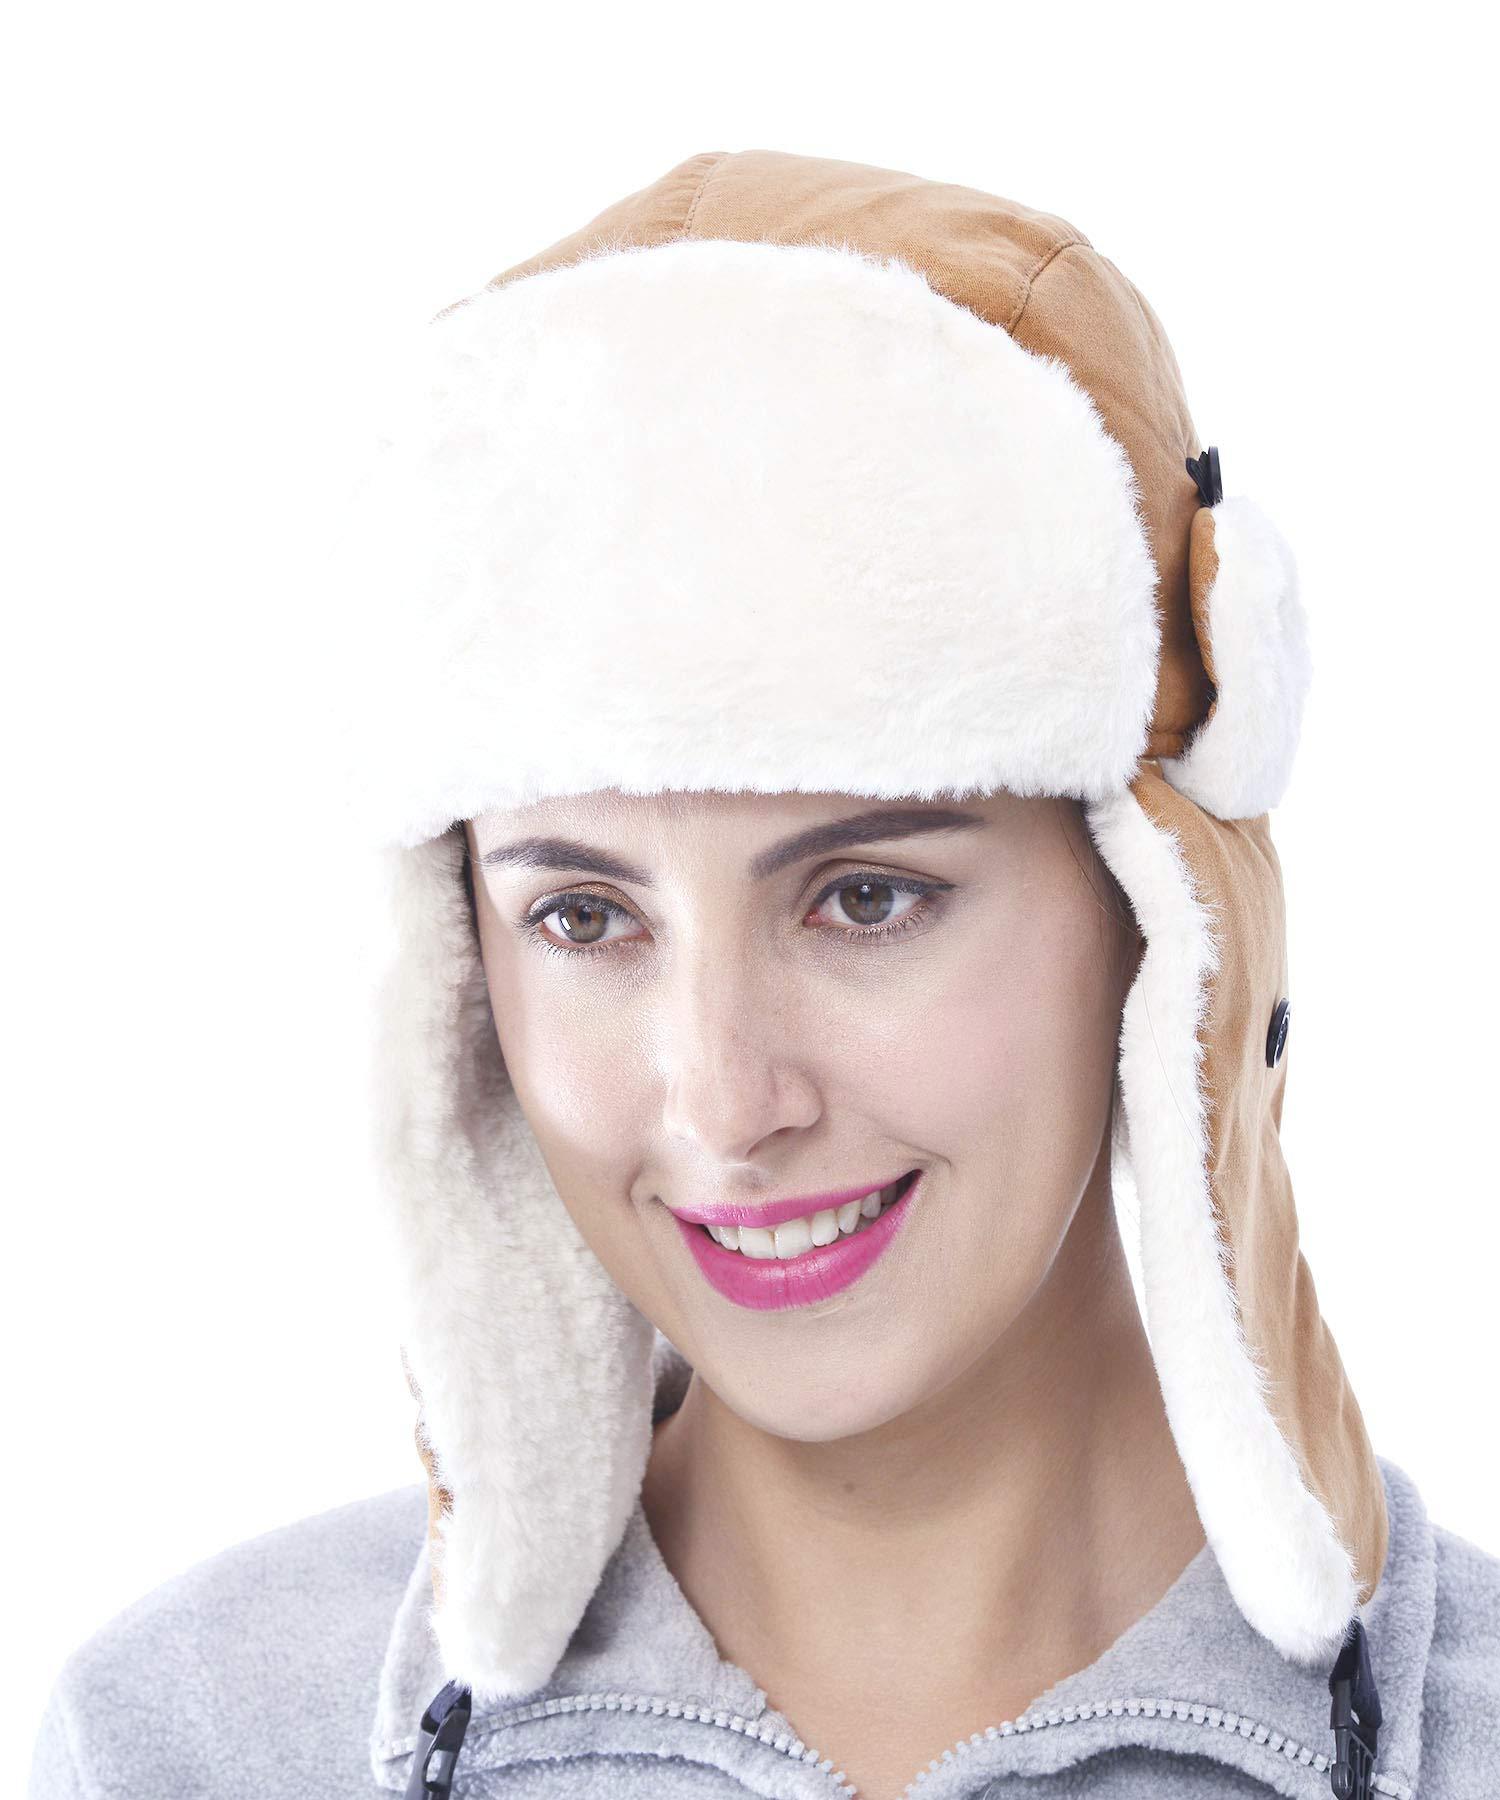 f365825b76a WuhouPro Womens Warm Winter Waterproof Faux Fur Trapper Hat product image